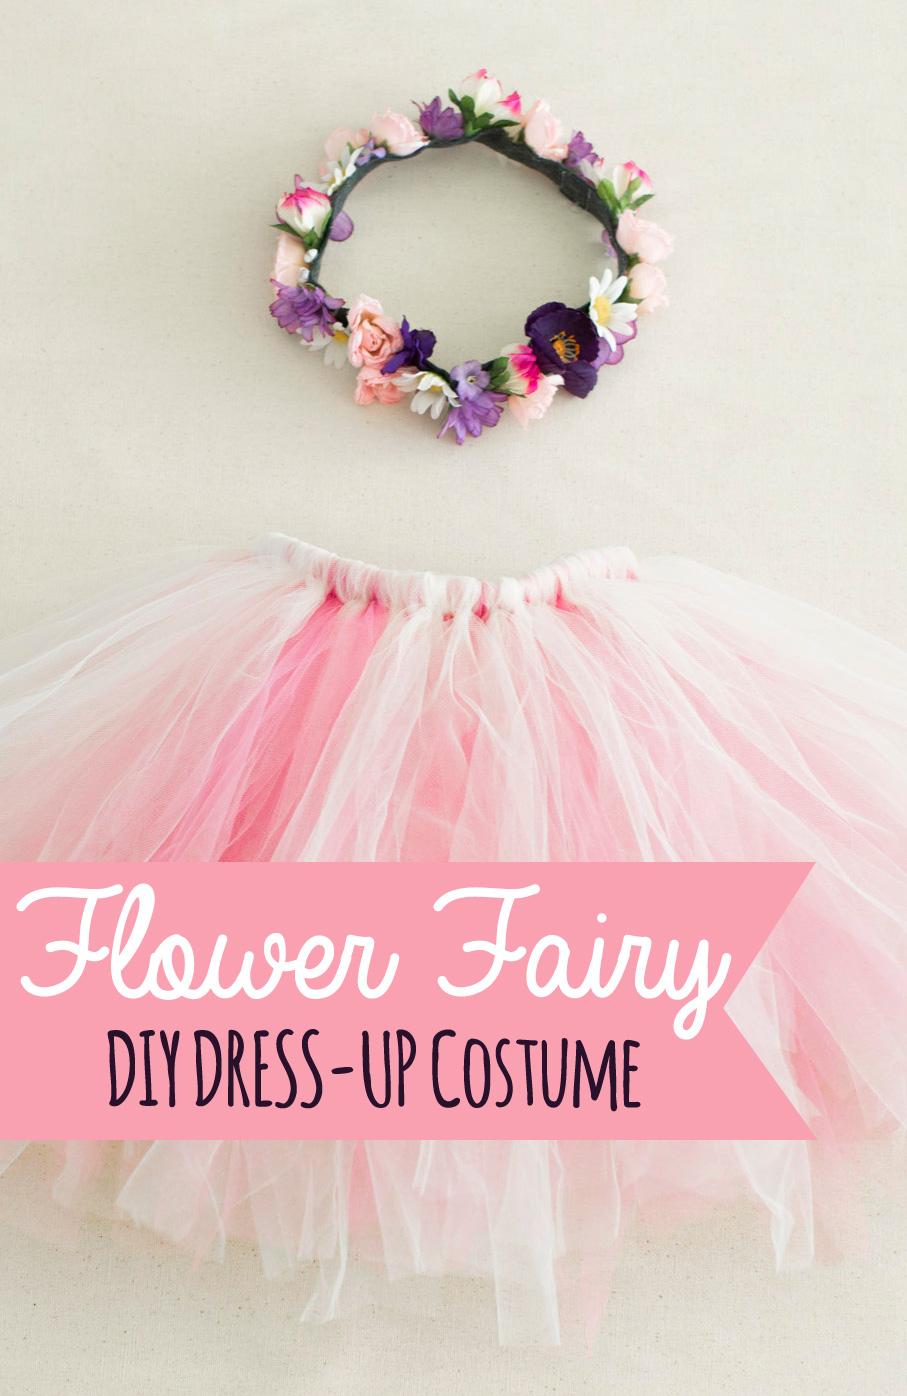 025a79d3874f The Nonpareil Home  DIY Costume - Flower Fairy